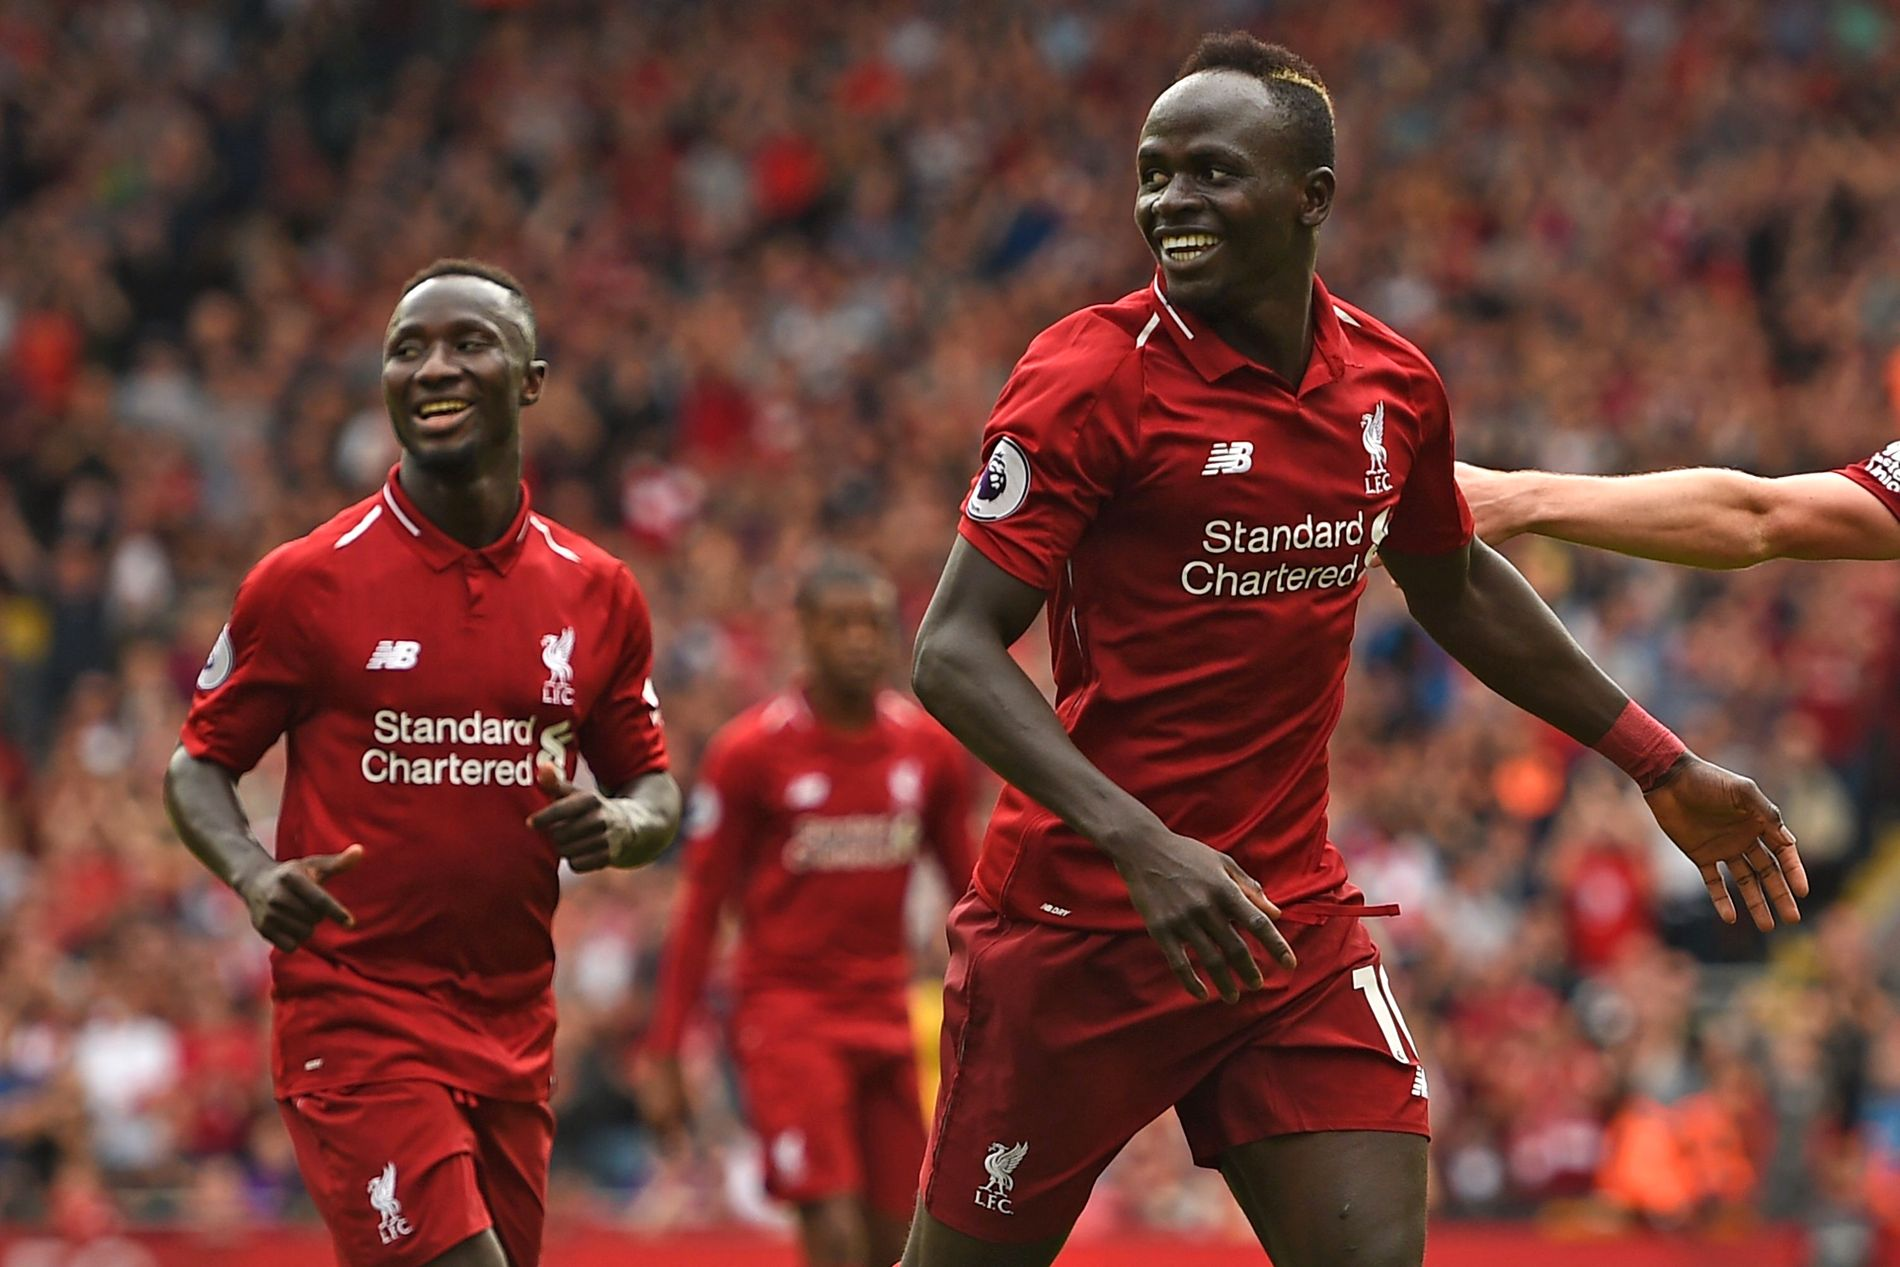 cd2f2dff SUKSESS: Sadio Mané (t.h.) er en svært viktig brikke for Liverpools  mannskap. Her er han sammen med Naby Keïta i seieren over West Ham i august  i fjor.